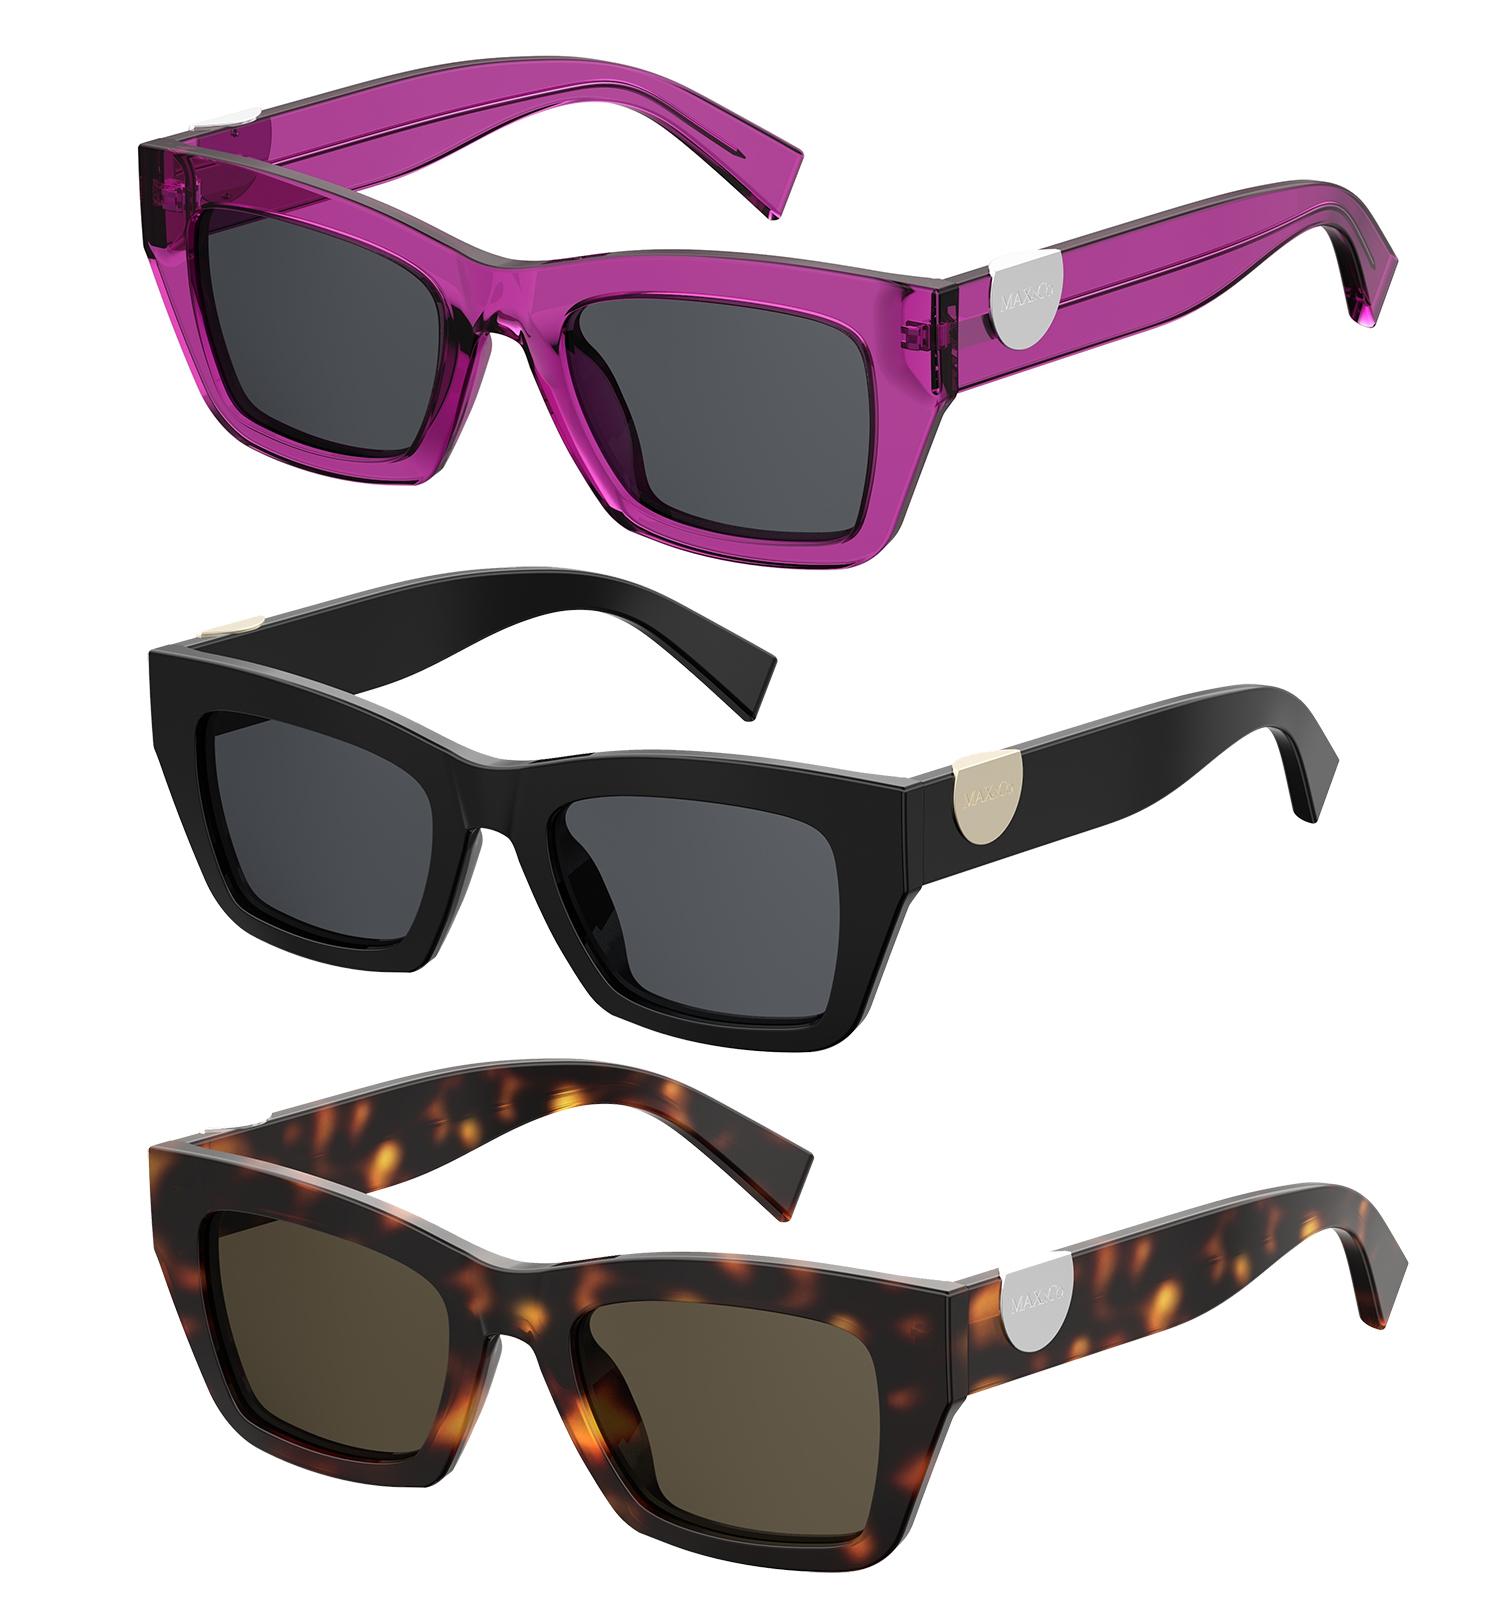 24e00e60d5 Αυτά τα ρετρό εμπνεύσεως αλλά απόλυτα σύγχρονα γυαλιά ηλίου και οράσεως